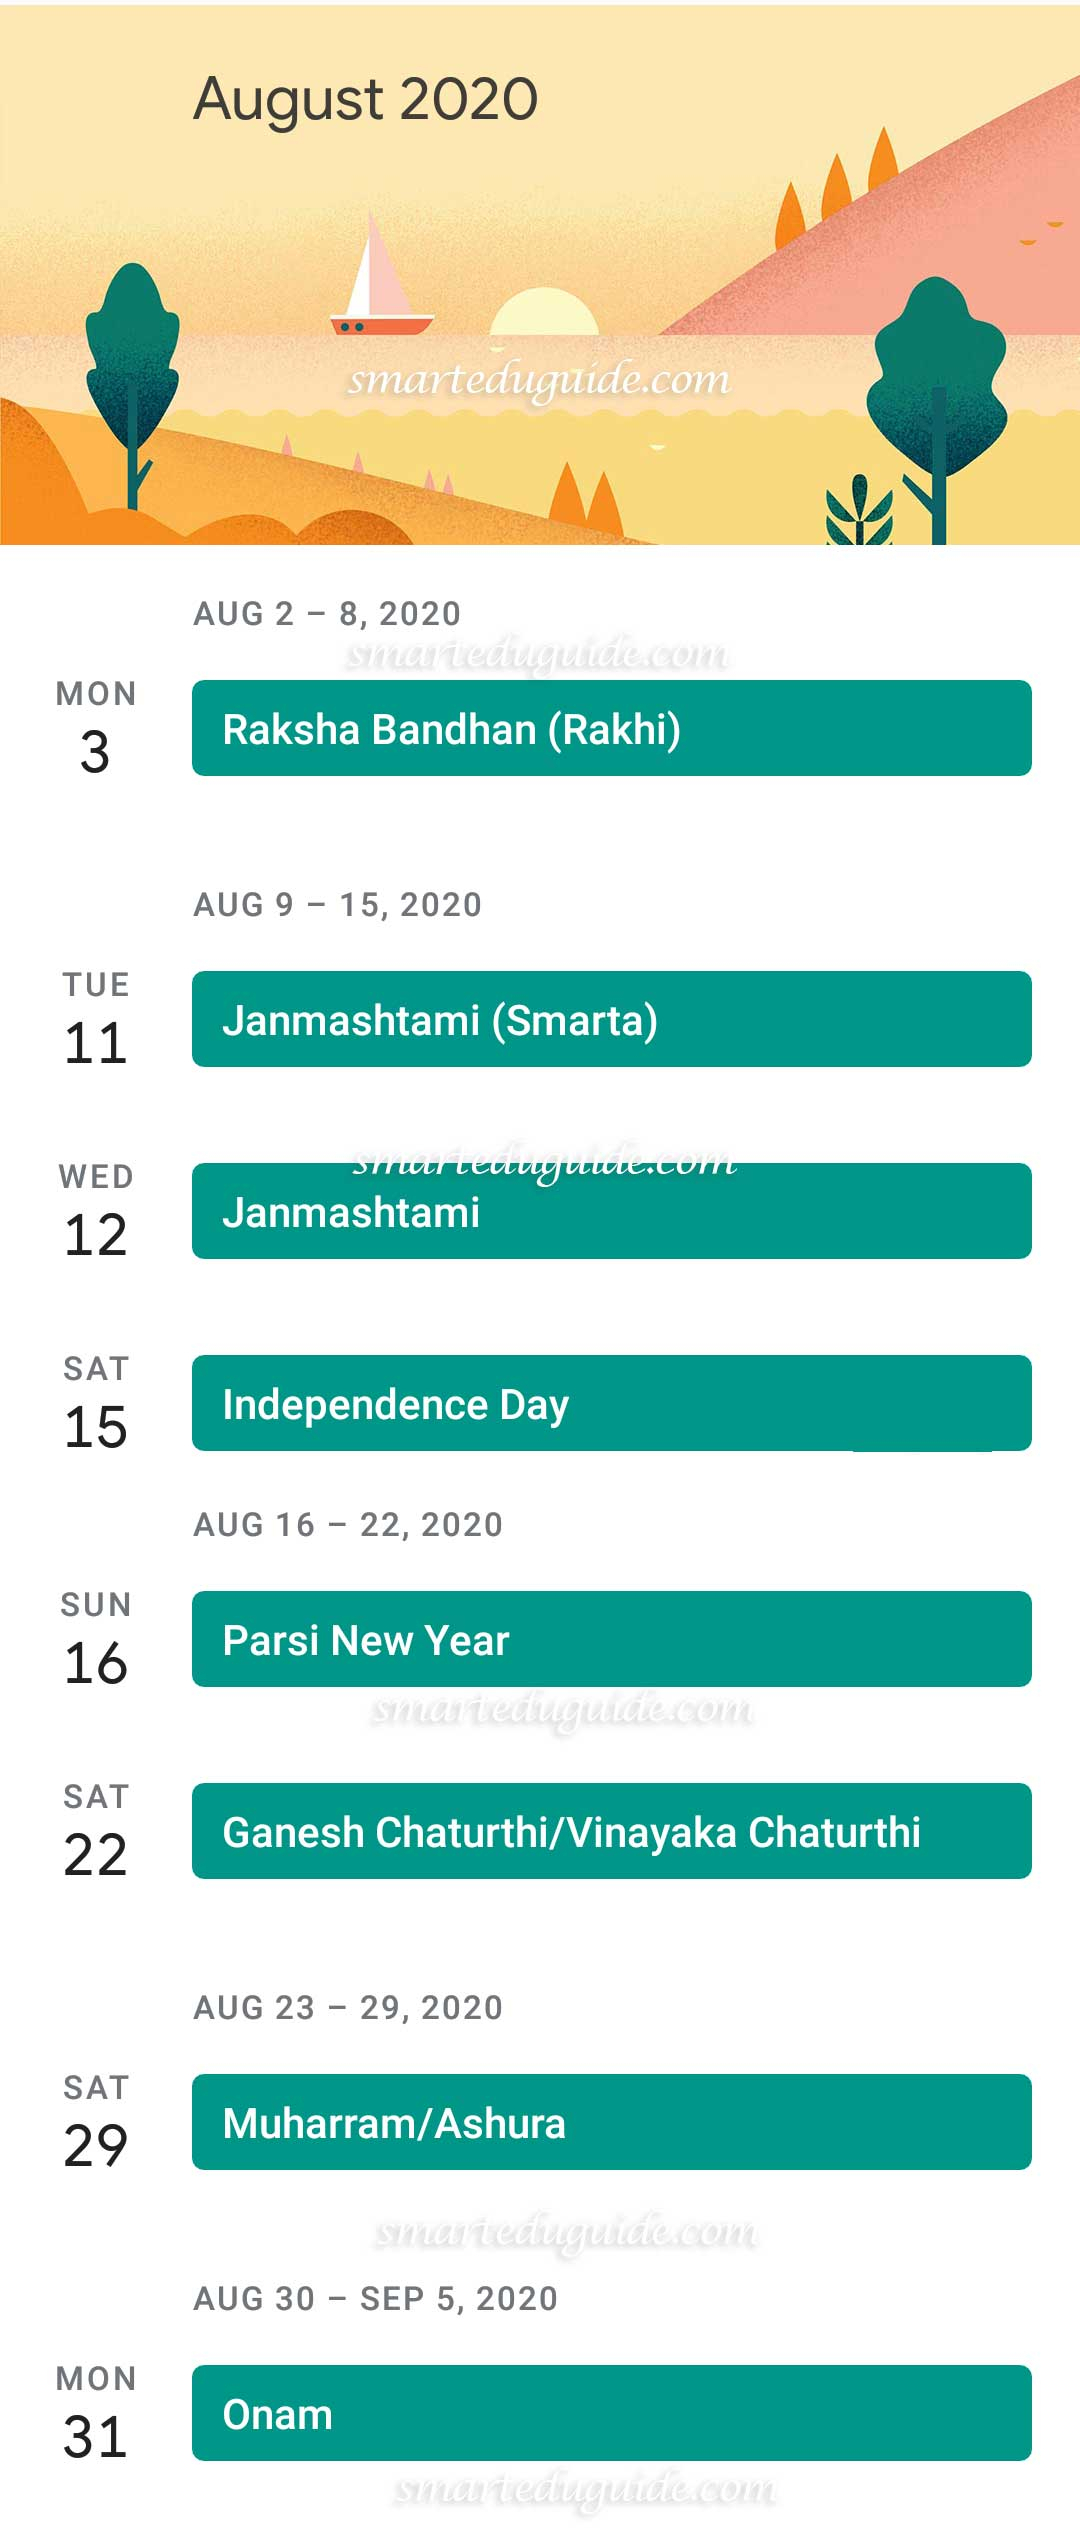 Calendar Aug 2020  Yatay.horizonconsulting.co intended for Kannada Calendar 2020 August